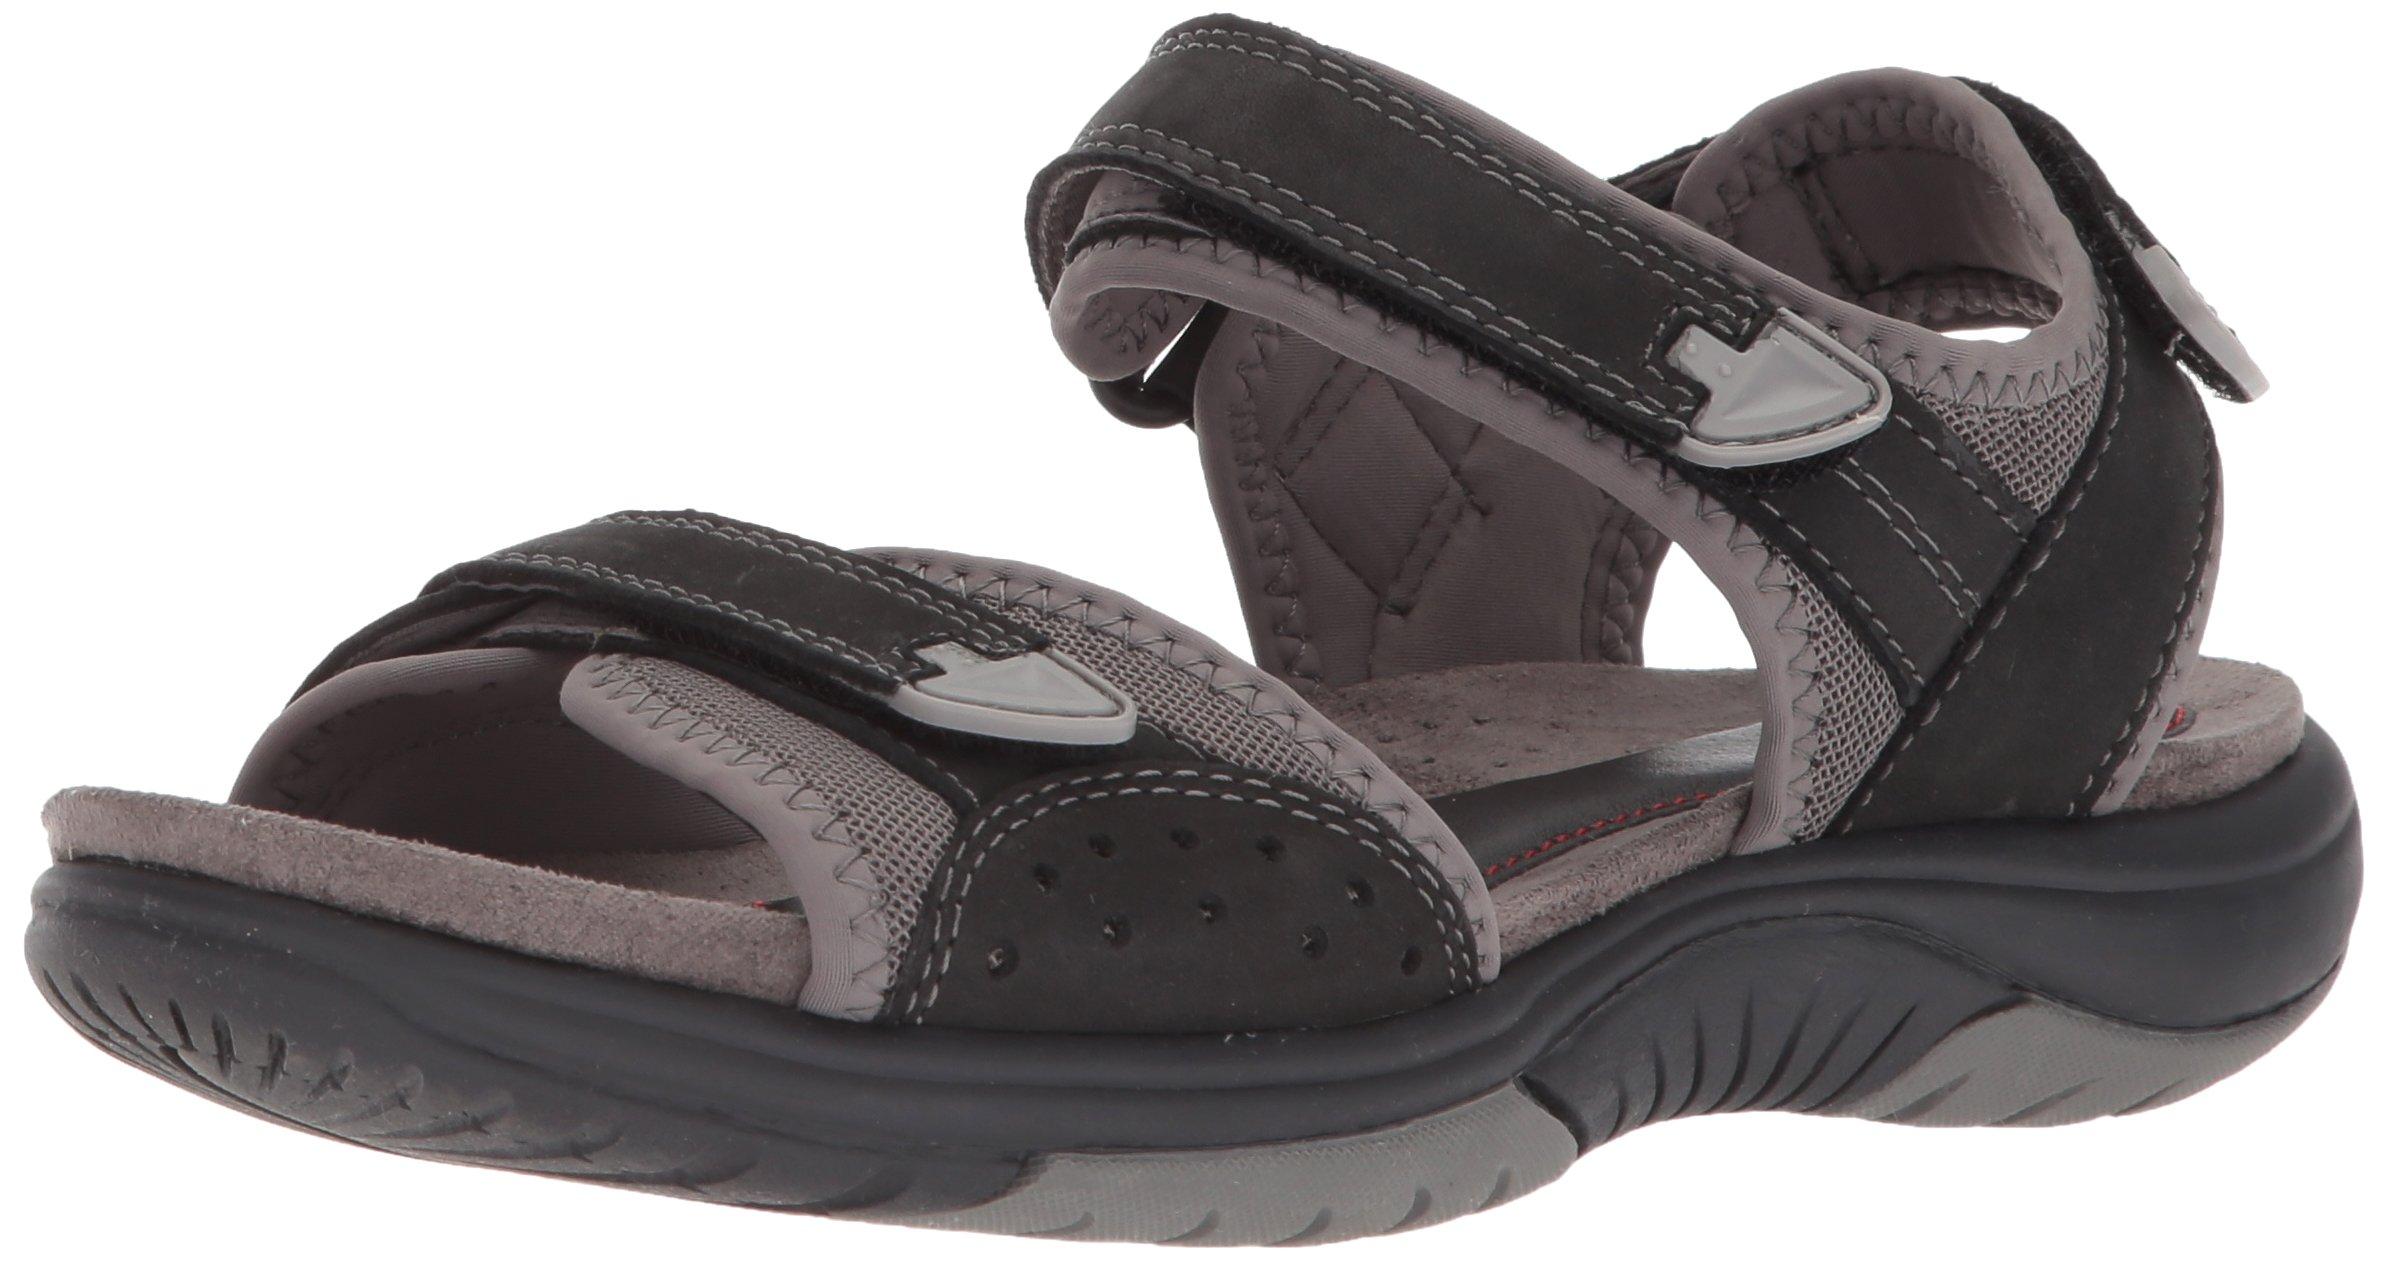 Rockport Women's Franklin Three Strap Sport Sandal, Black, 9.5 M US